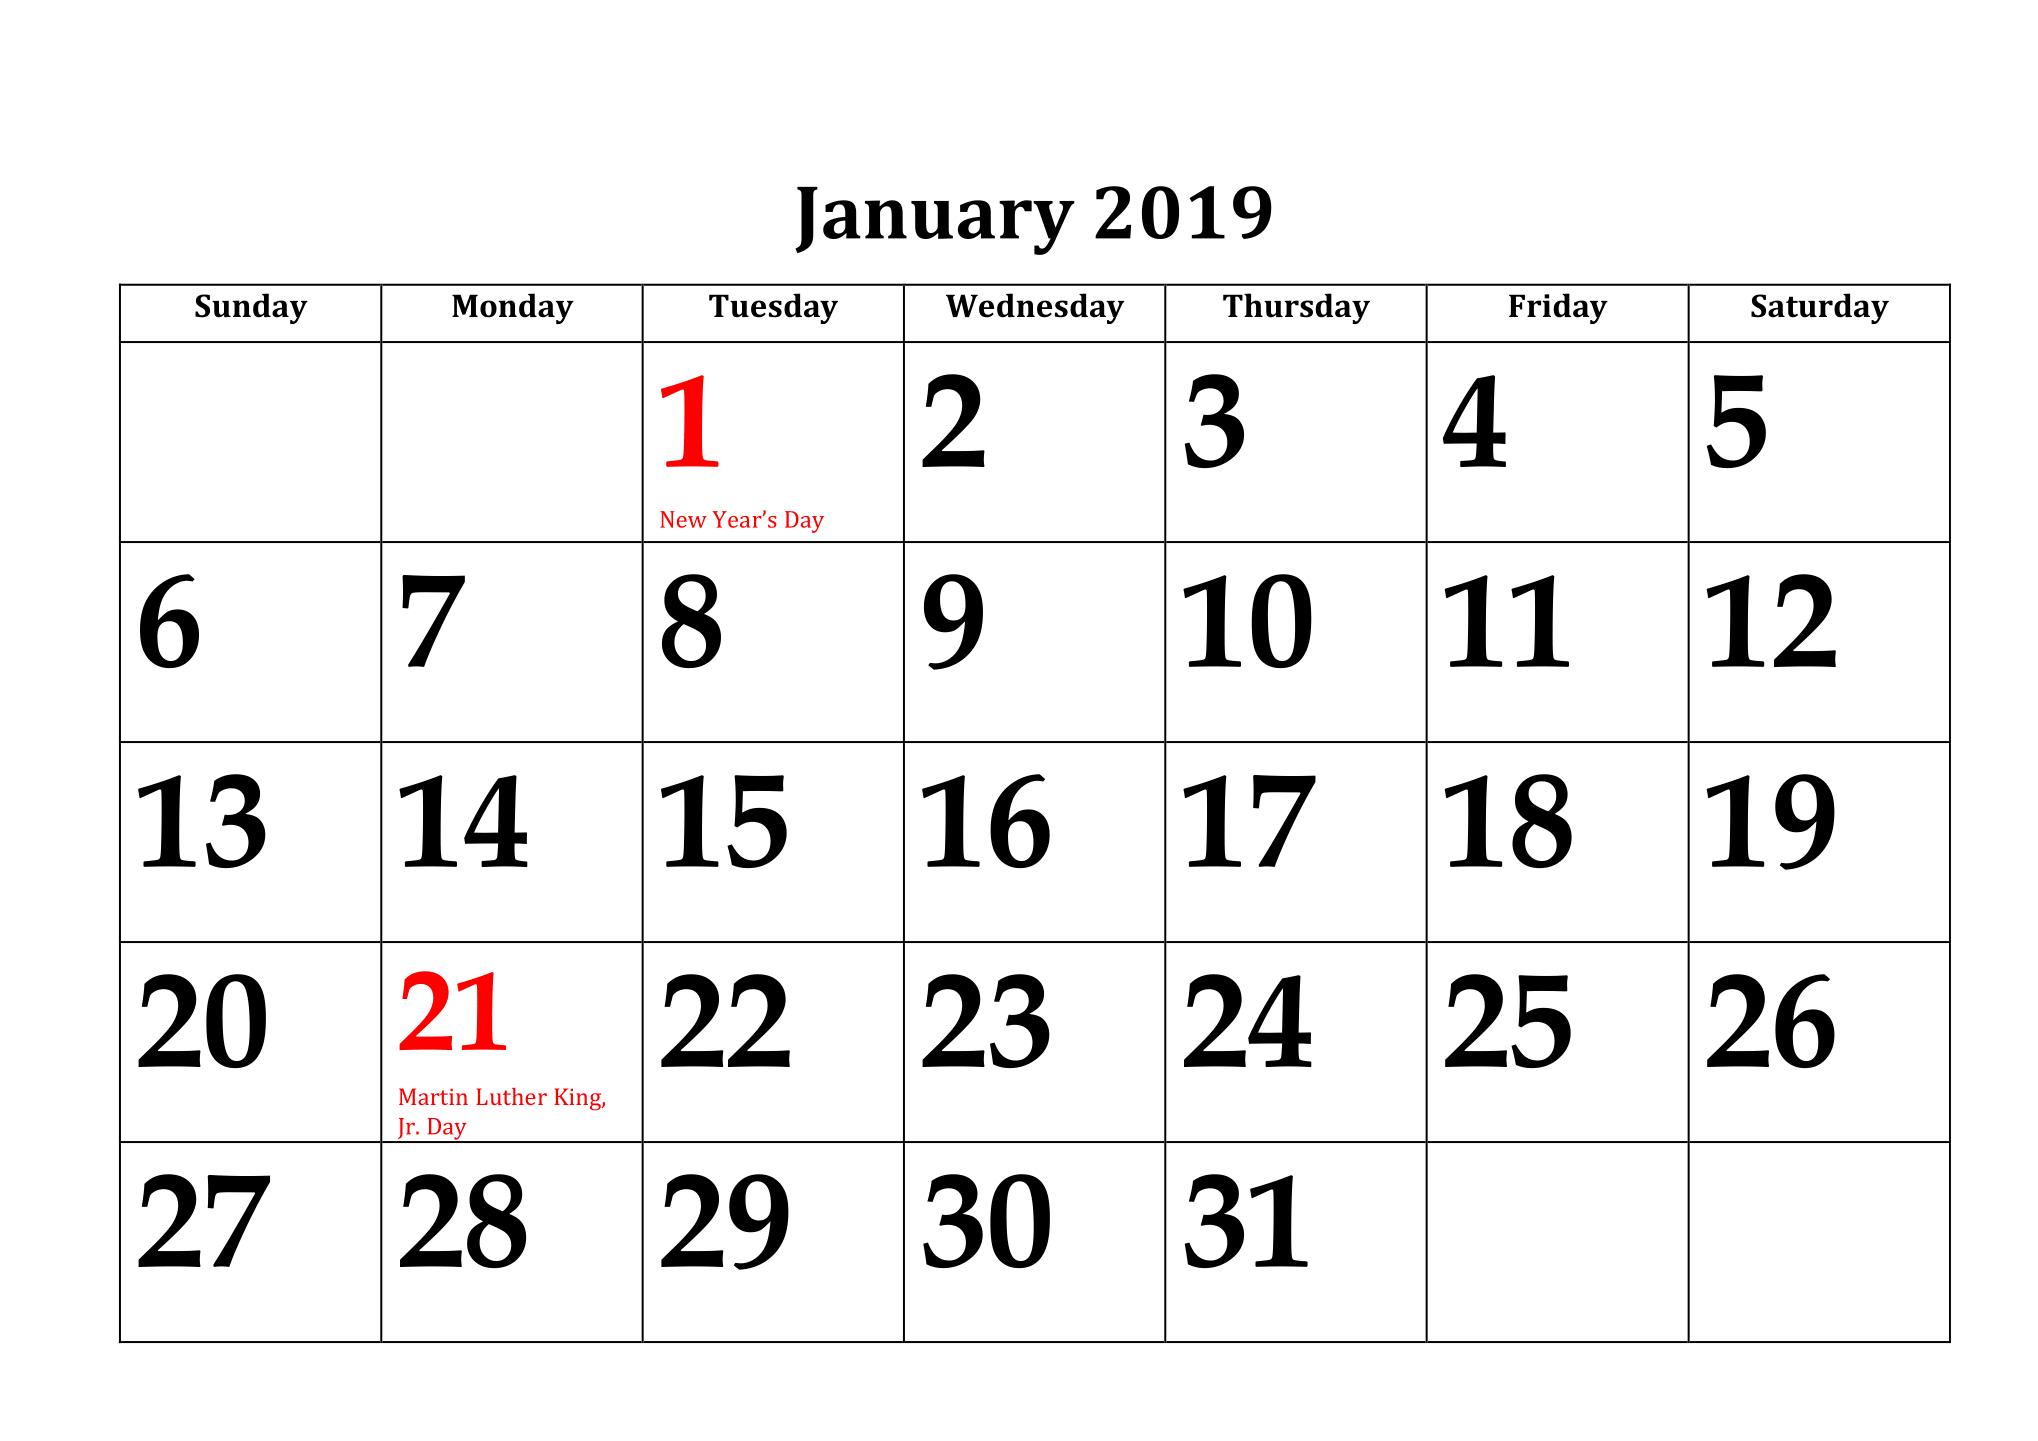 Print January 2019 Calendar With Holidays - Printable Calendar Templates with regard to January Calendar Printable Template With Holidays